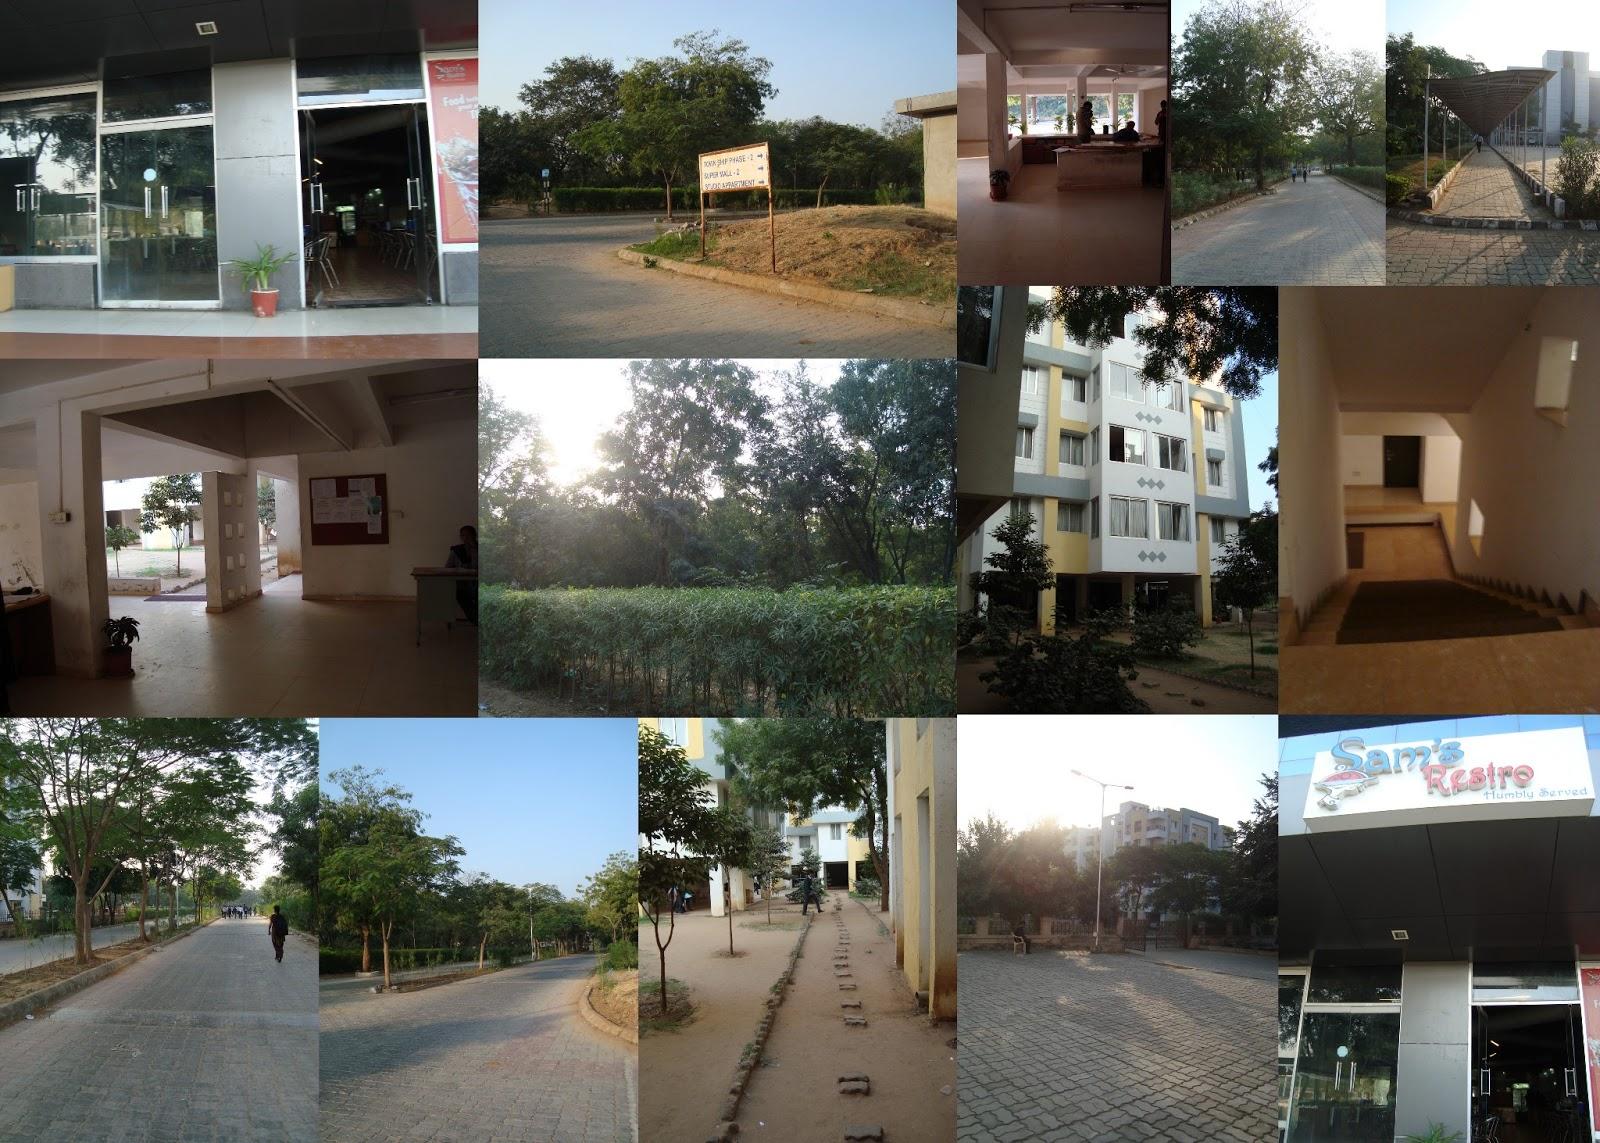 Studio Apartment Gandhinagar Infocity catalogue of my travelogue: studio apartment, infocity, gandhinagar..